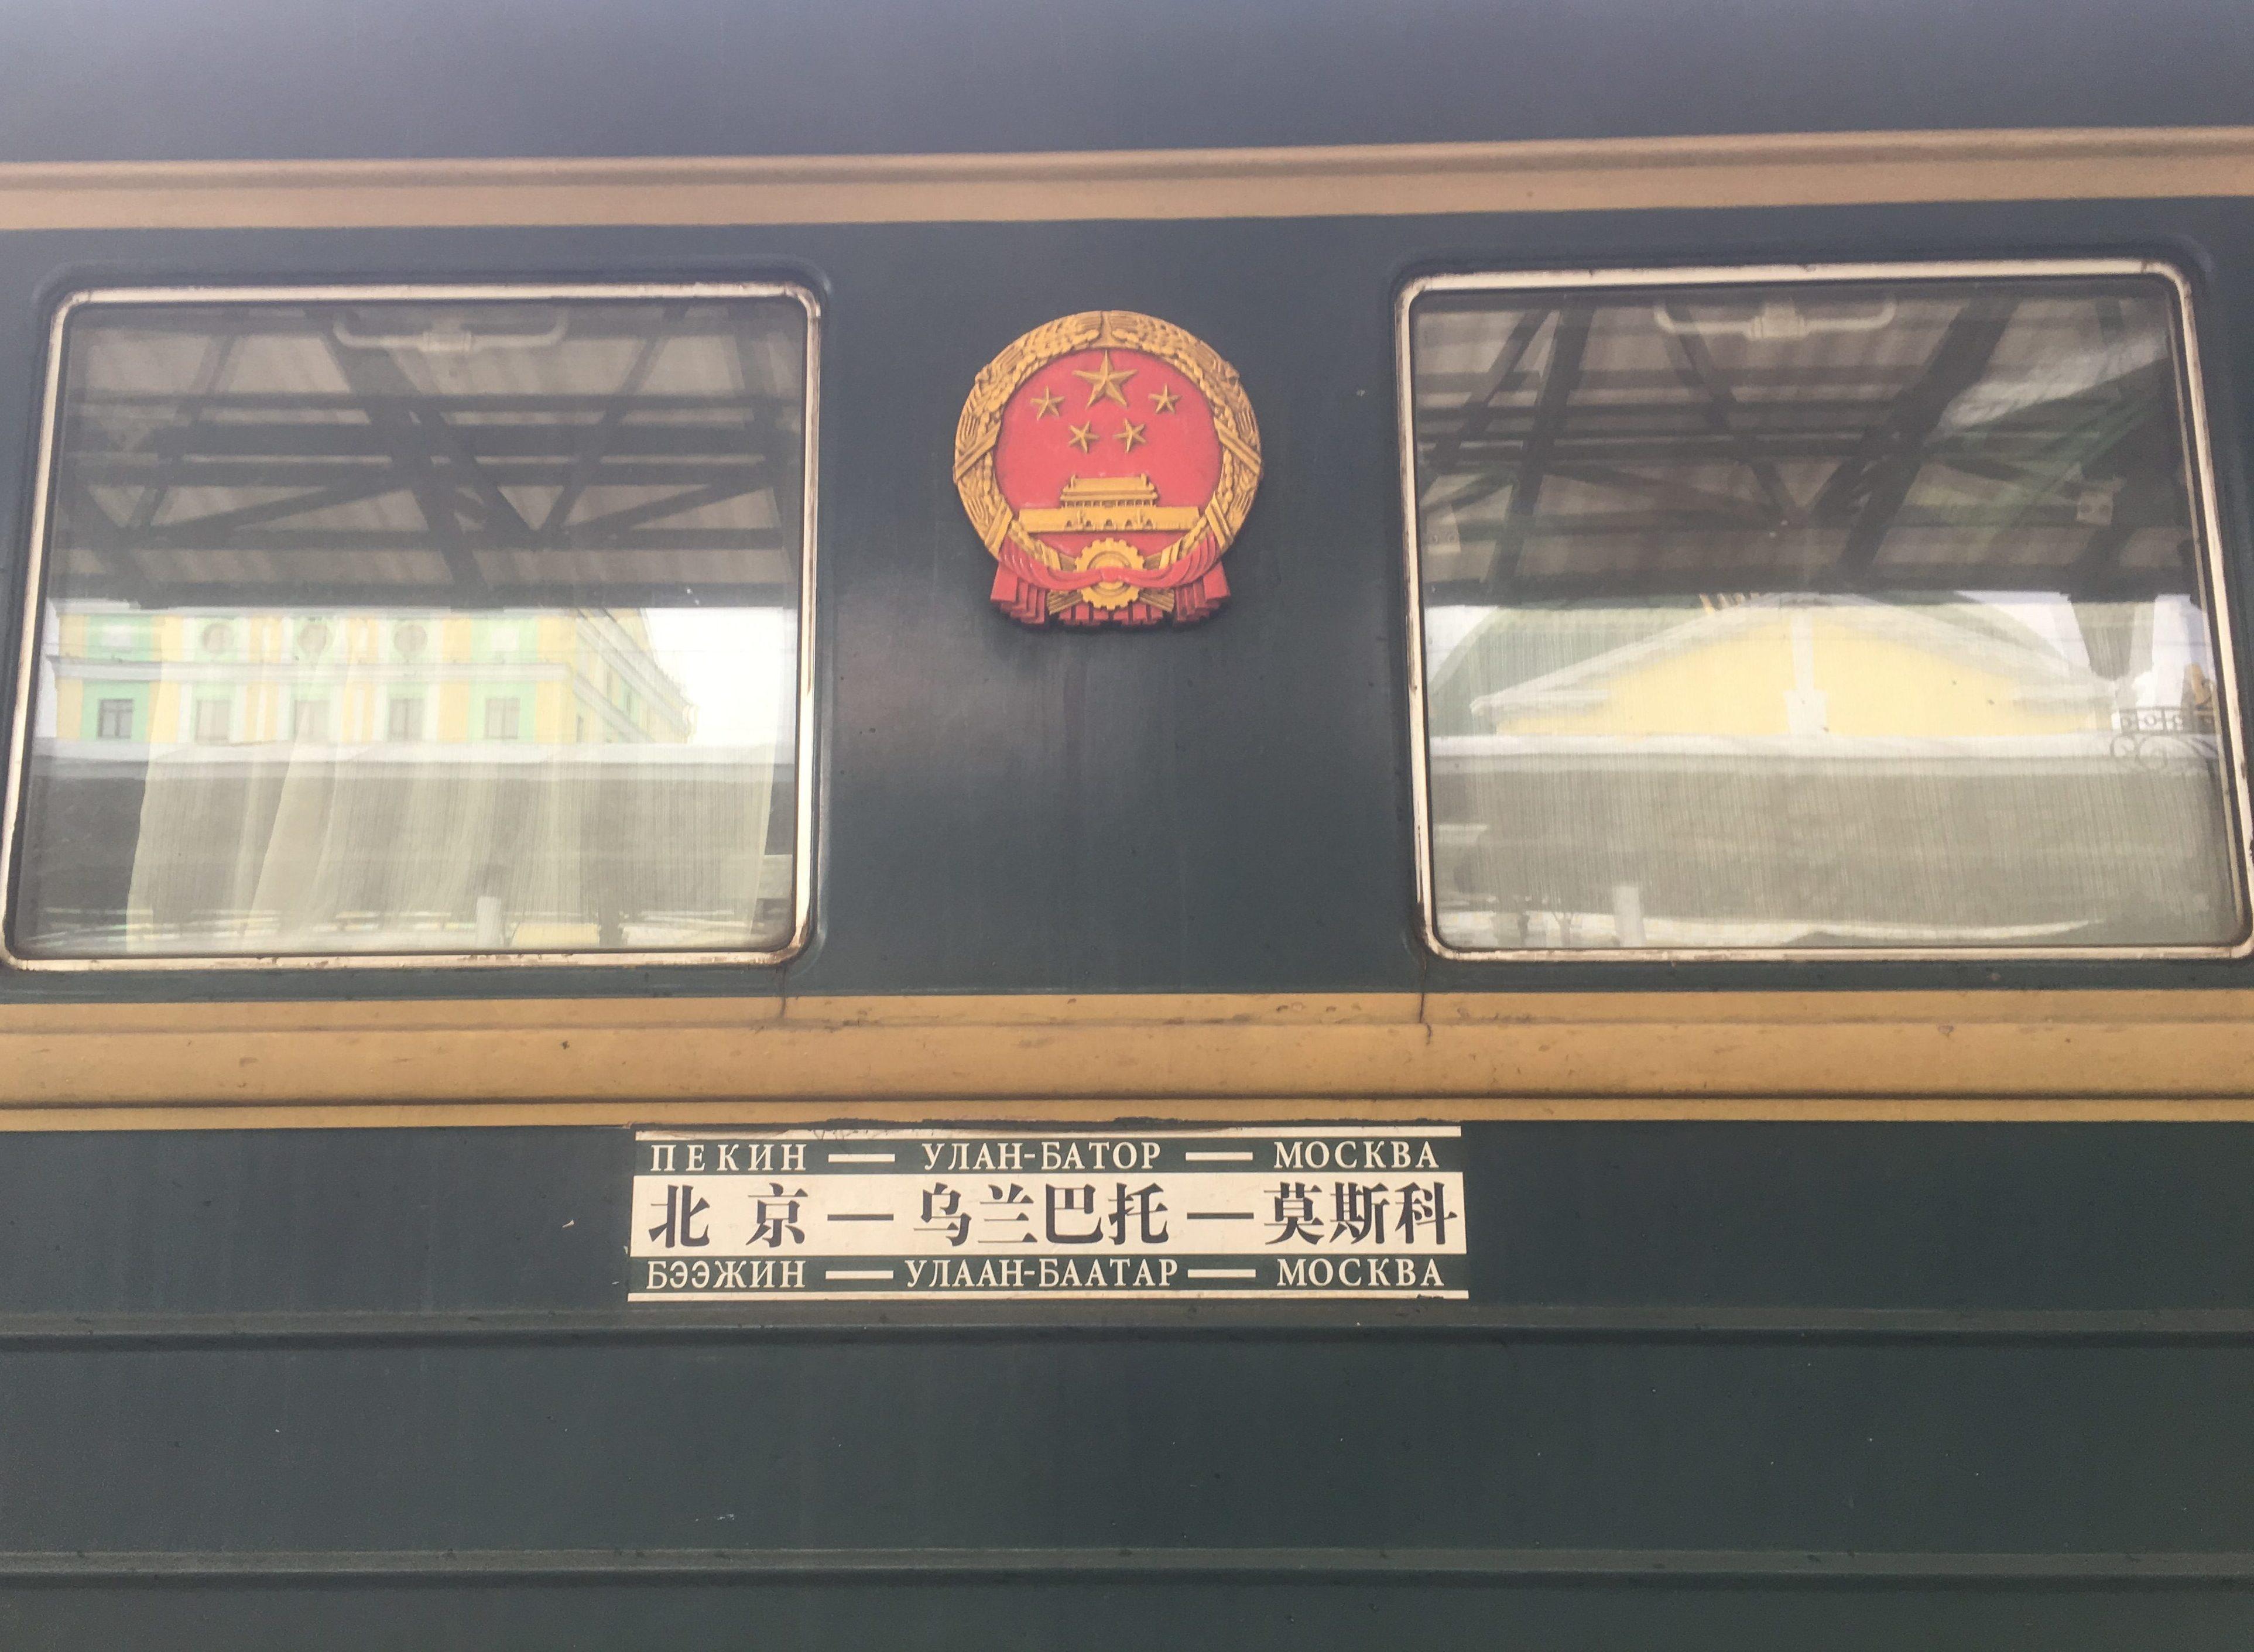 Chinese carriage badge - stopped at Krasnoyarsk